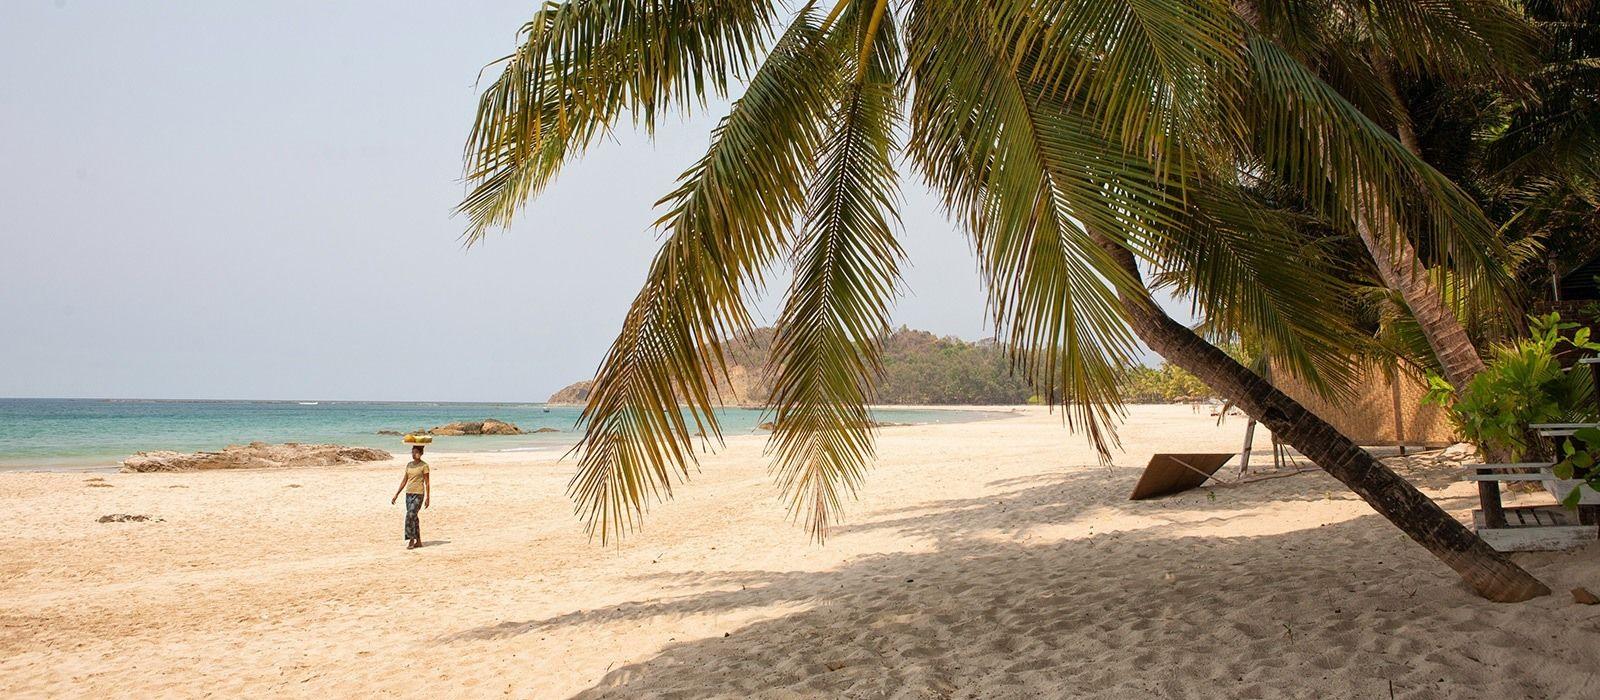 Myanmar: Beaches to Golden Rock Tour Trip 6